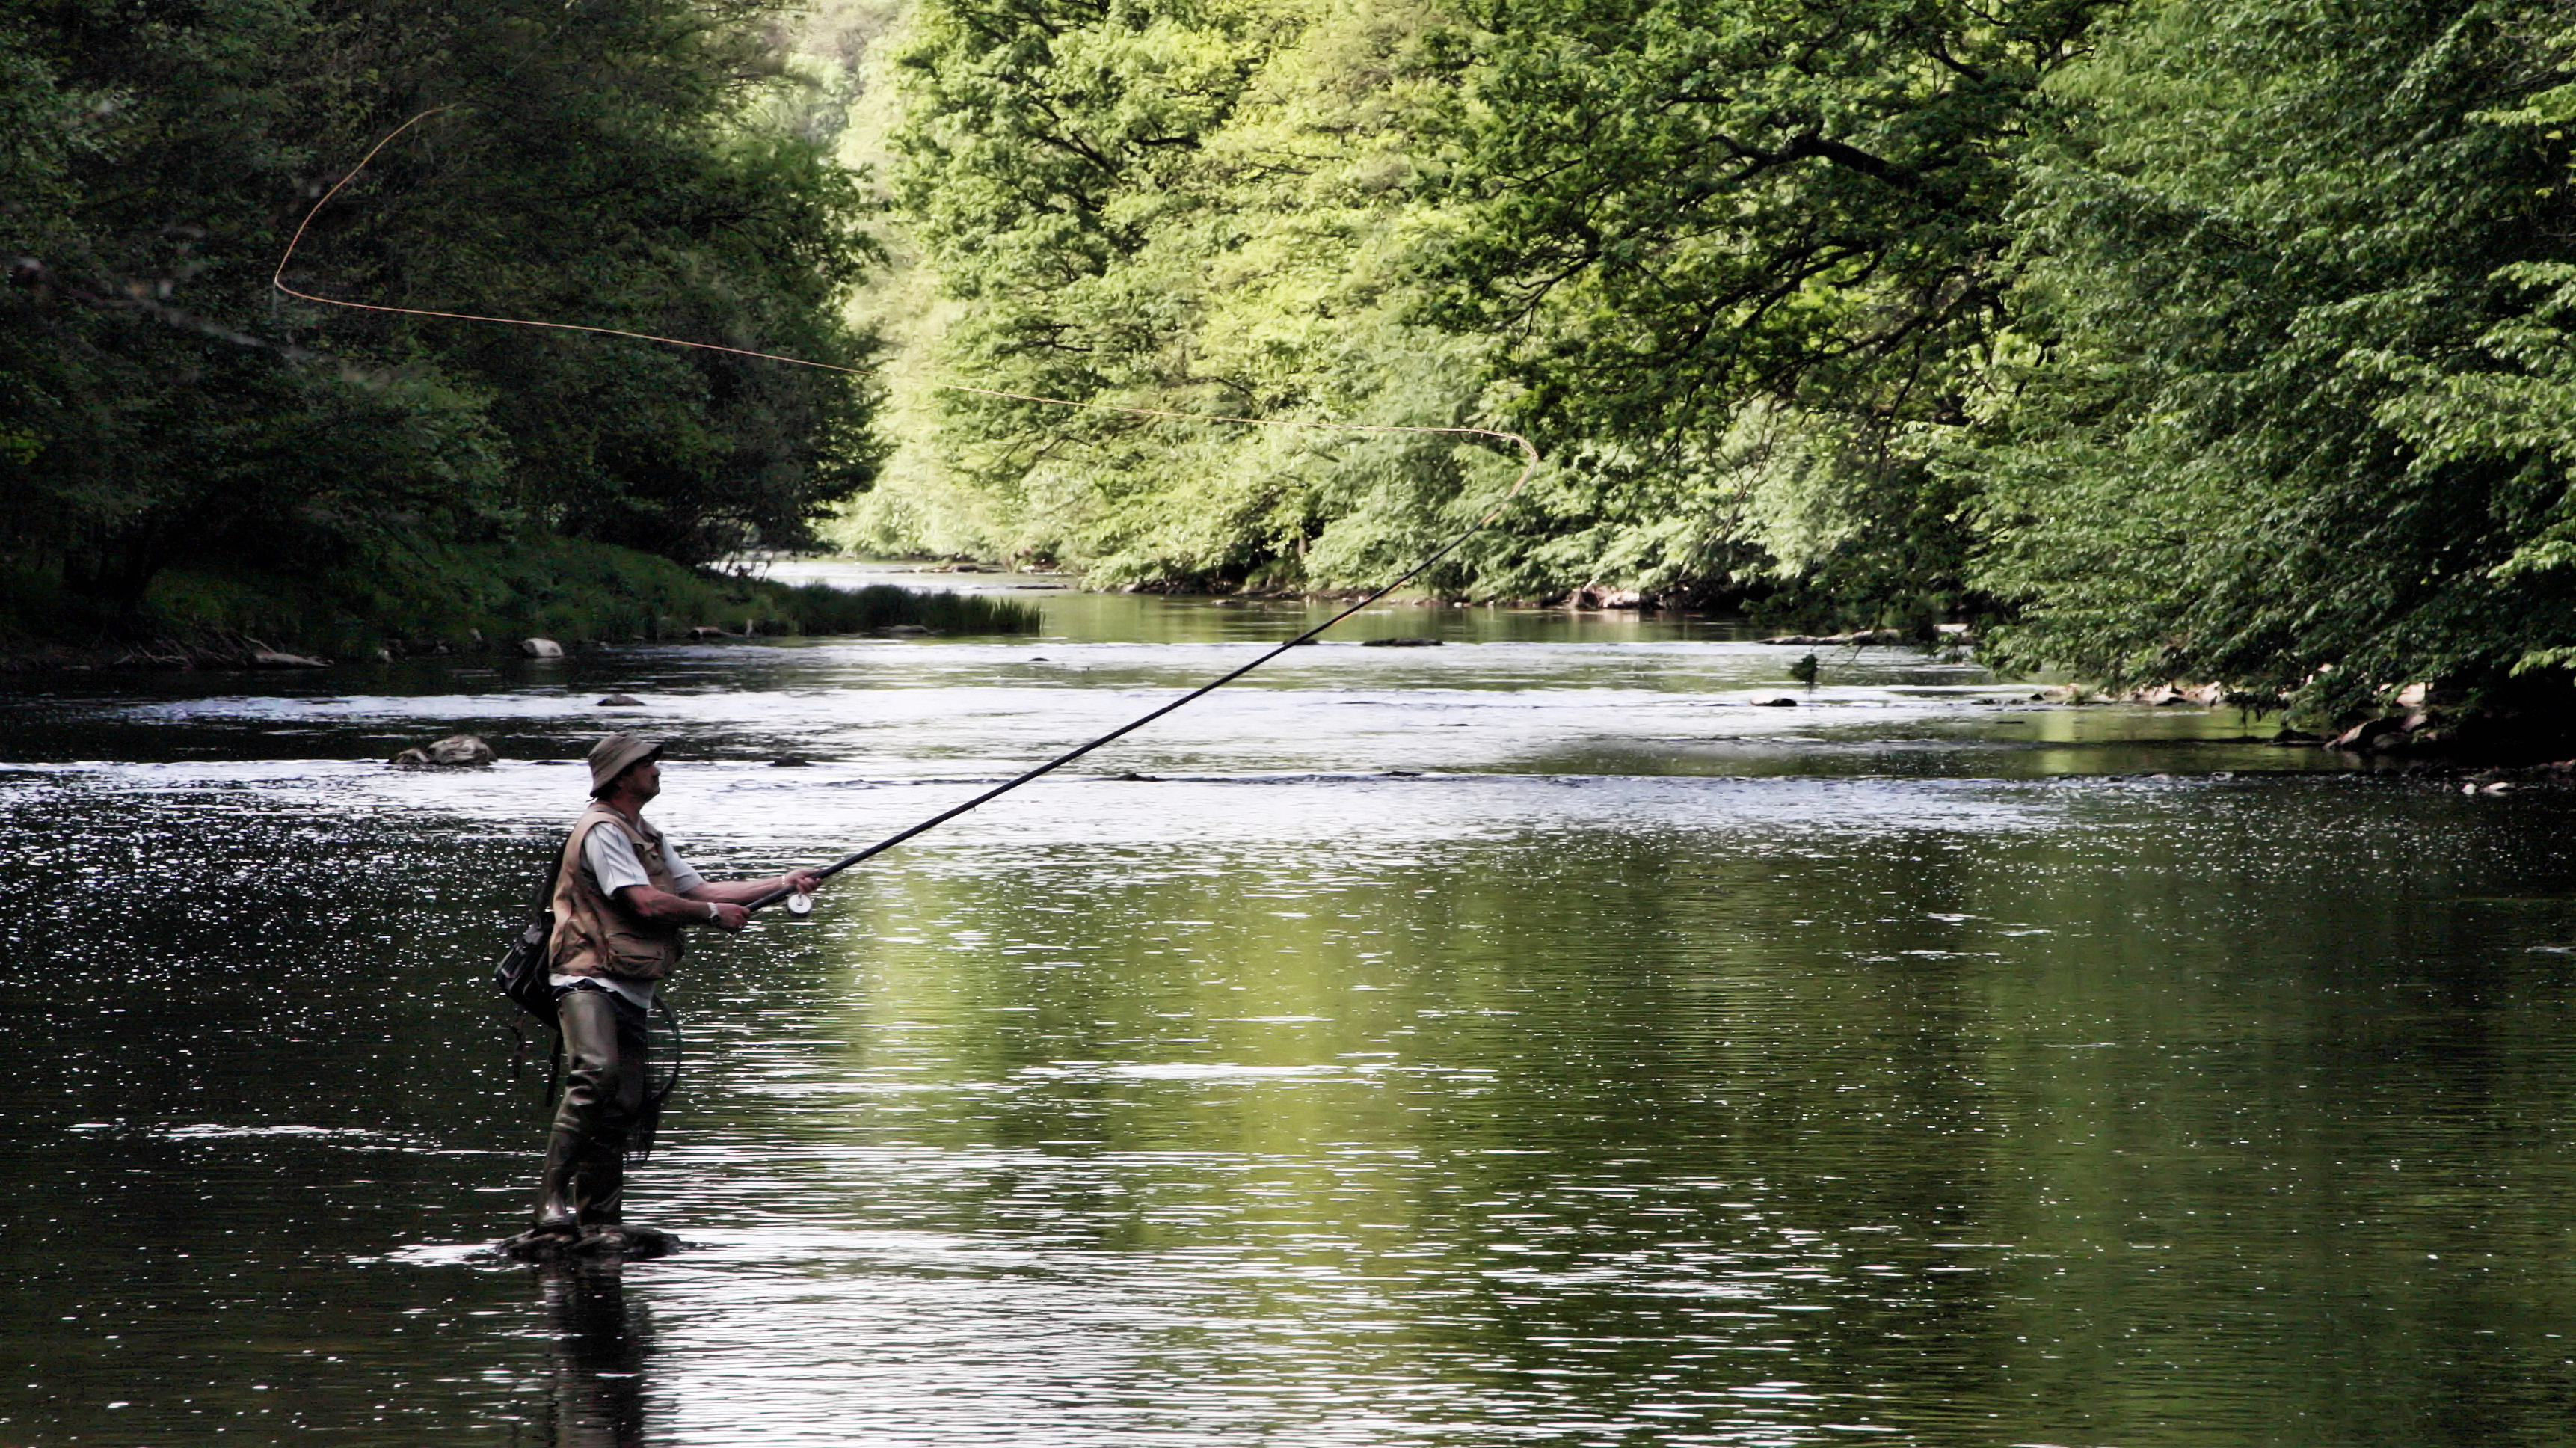 Dans le contact syzran la pêche